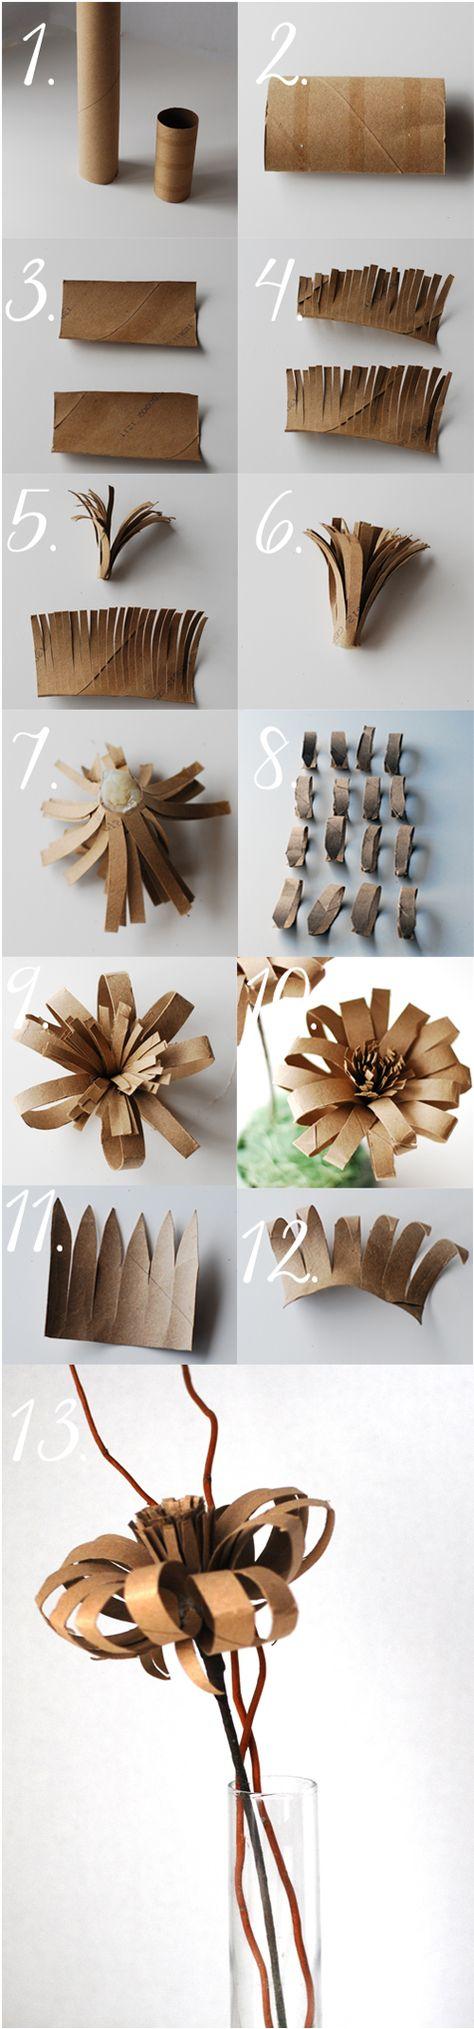 Wonderful DIY Amazing Flower Toilet Paper Roll Art | WonderfulDIY.com